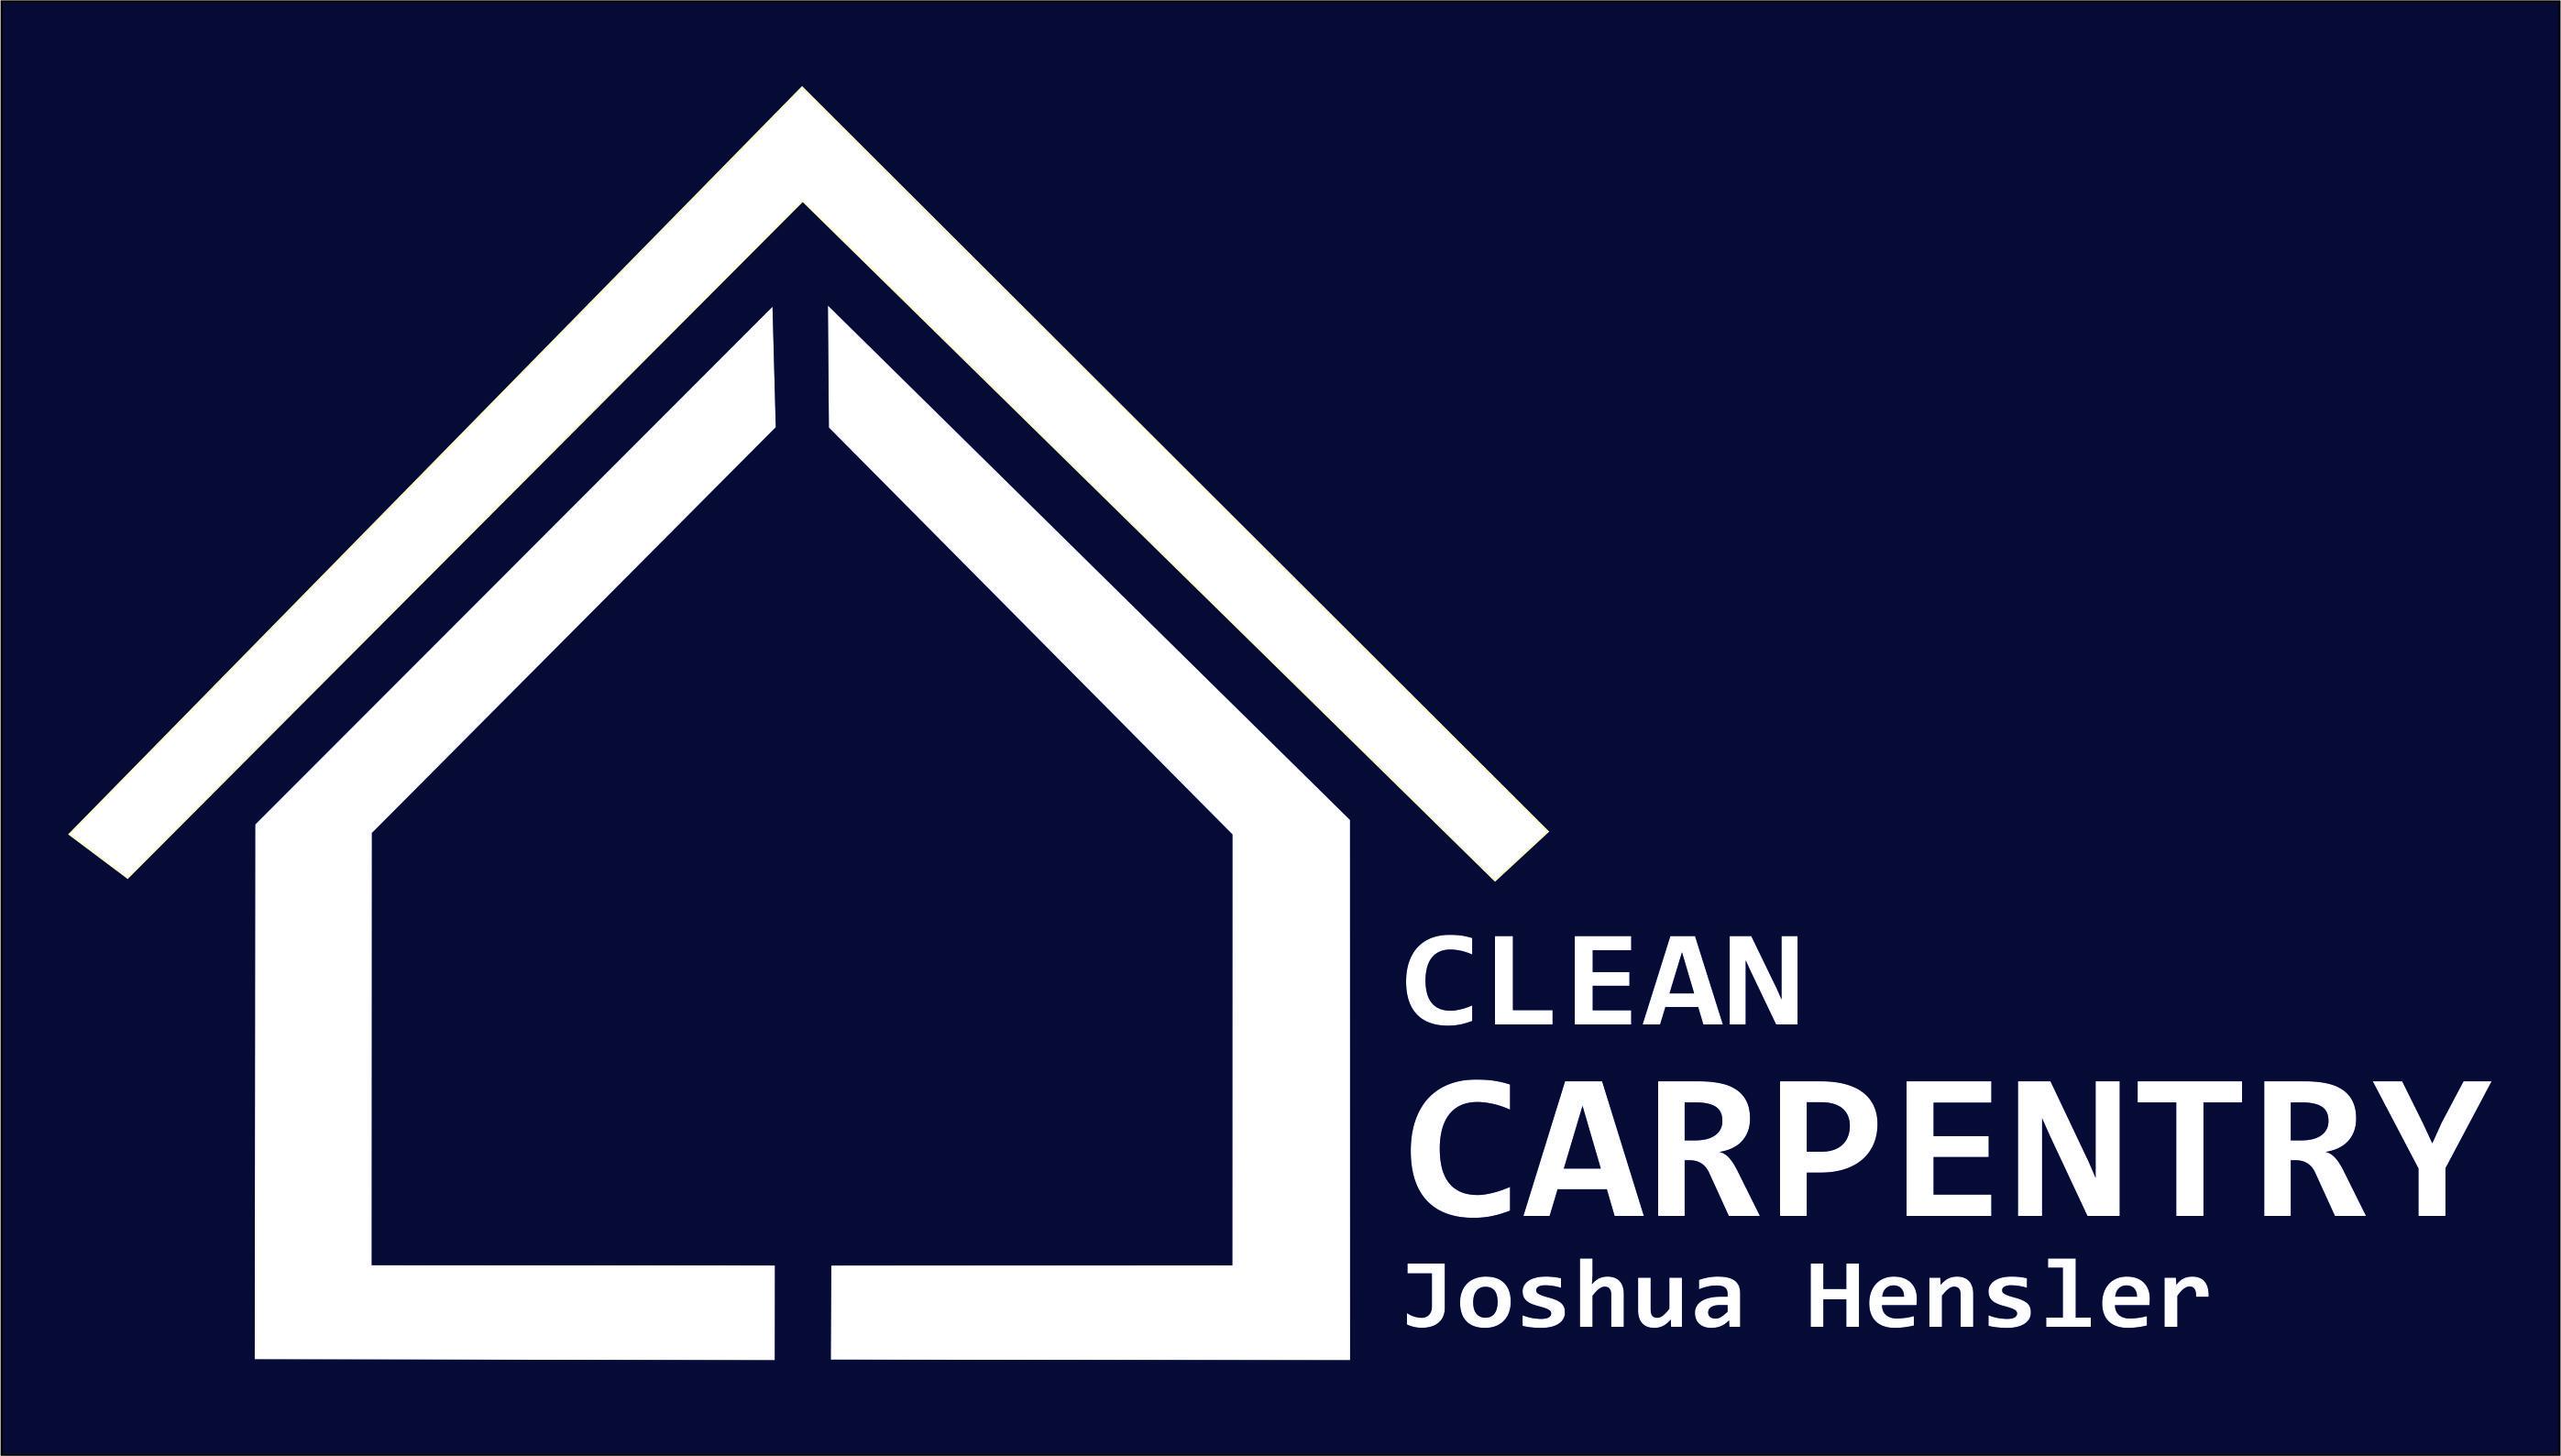 Clean Carpentry